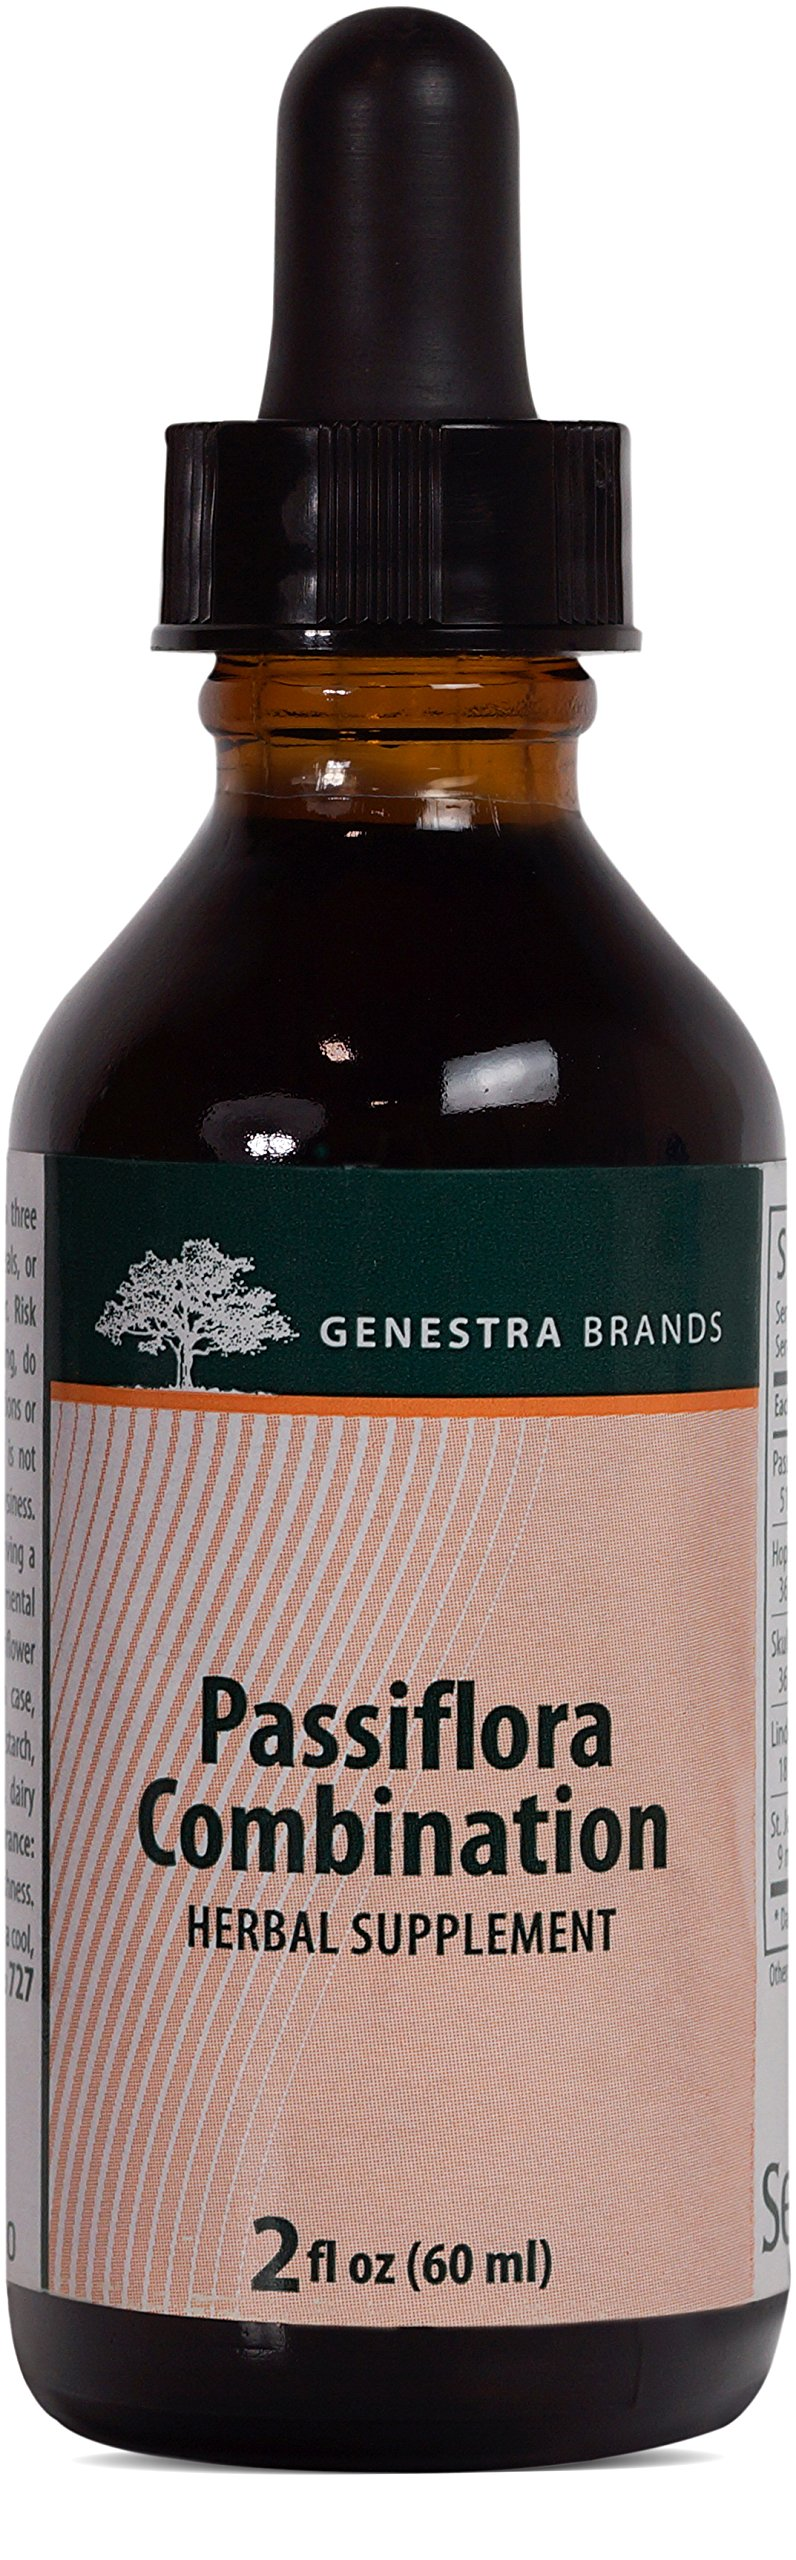 Genestra Brands - Passiflora Combination - Passionflower, Hops, Skullcap, American Basswood and St. John's Wort - 2 fl oz (60 ml) by Genestra Brands (Image #1)